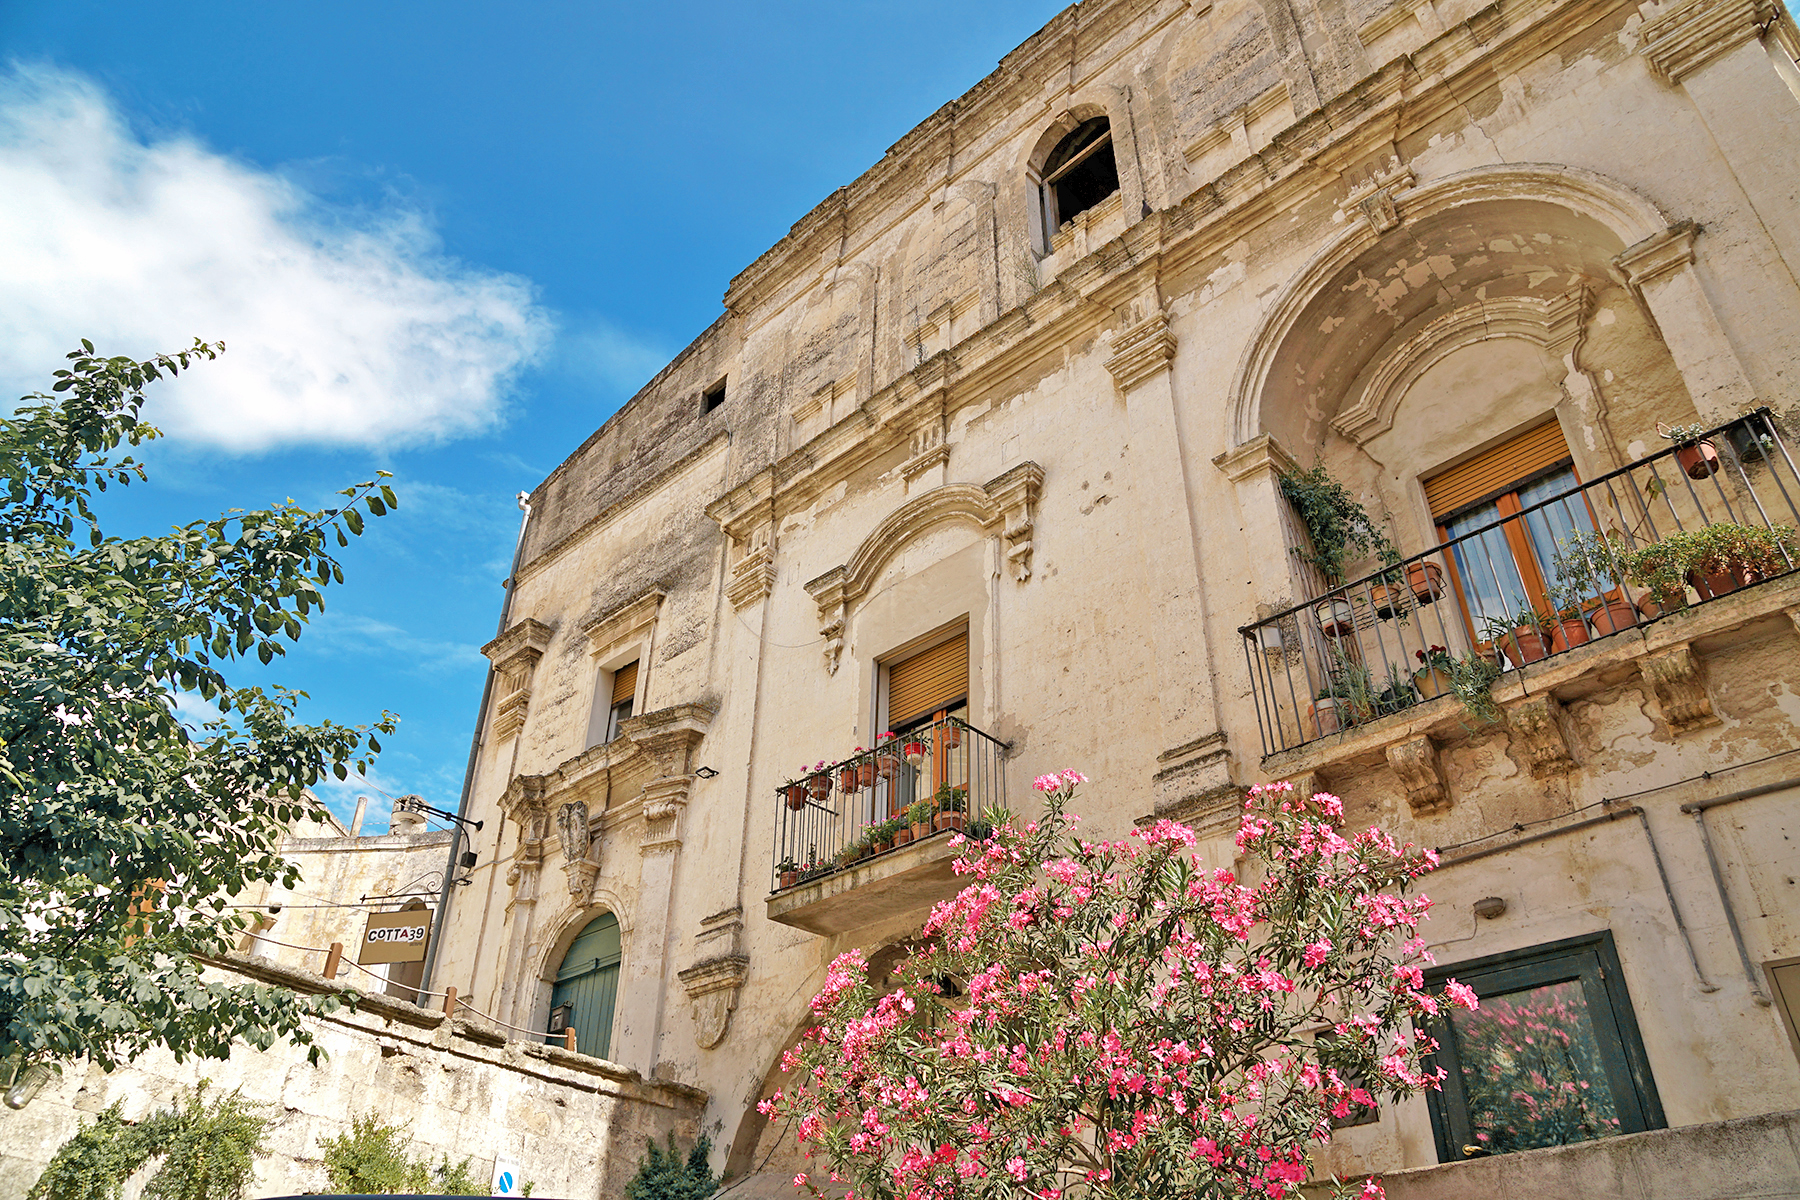 Immeuble fleuri Matera, Italie